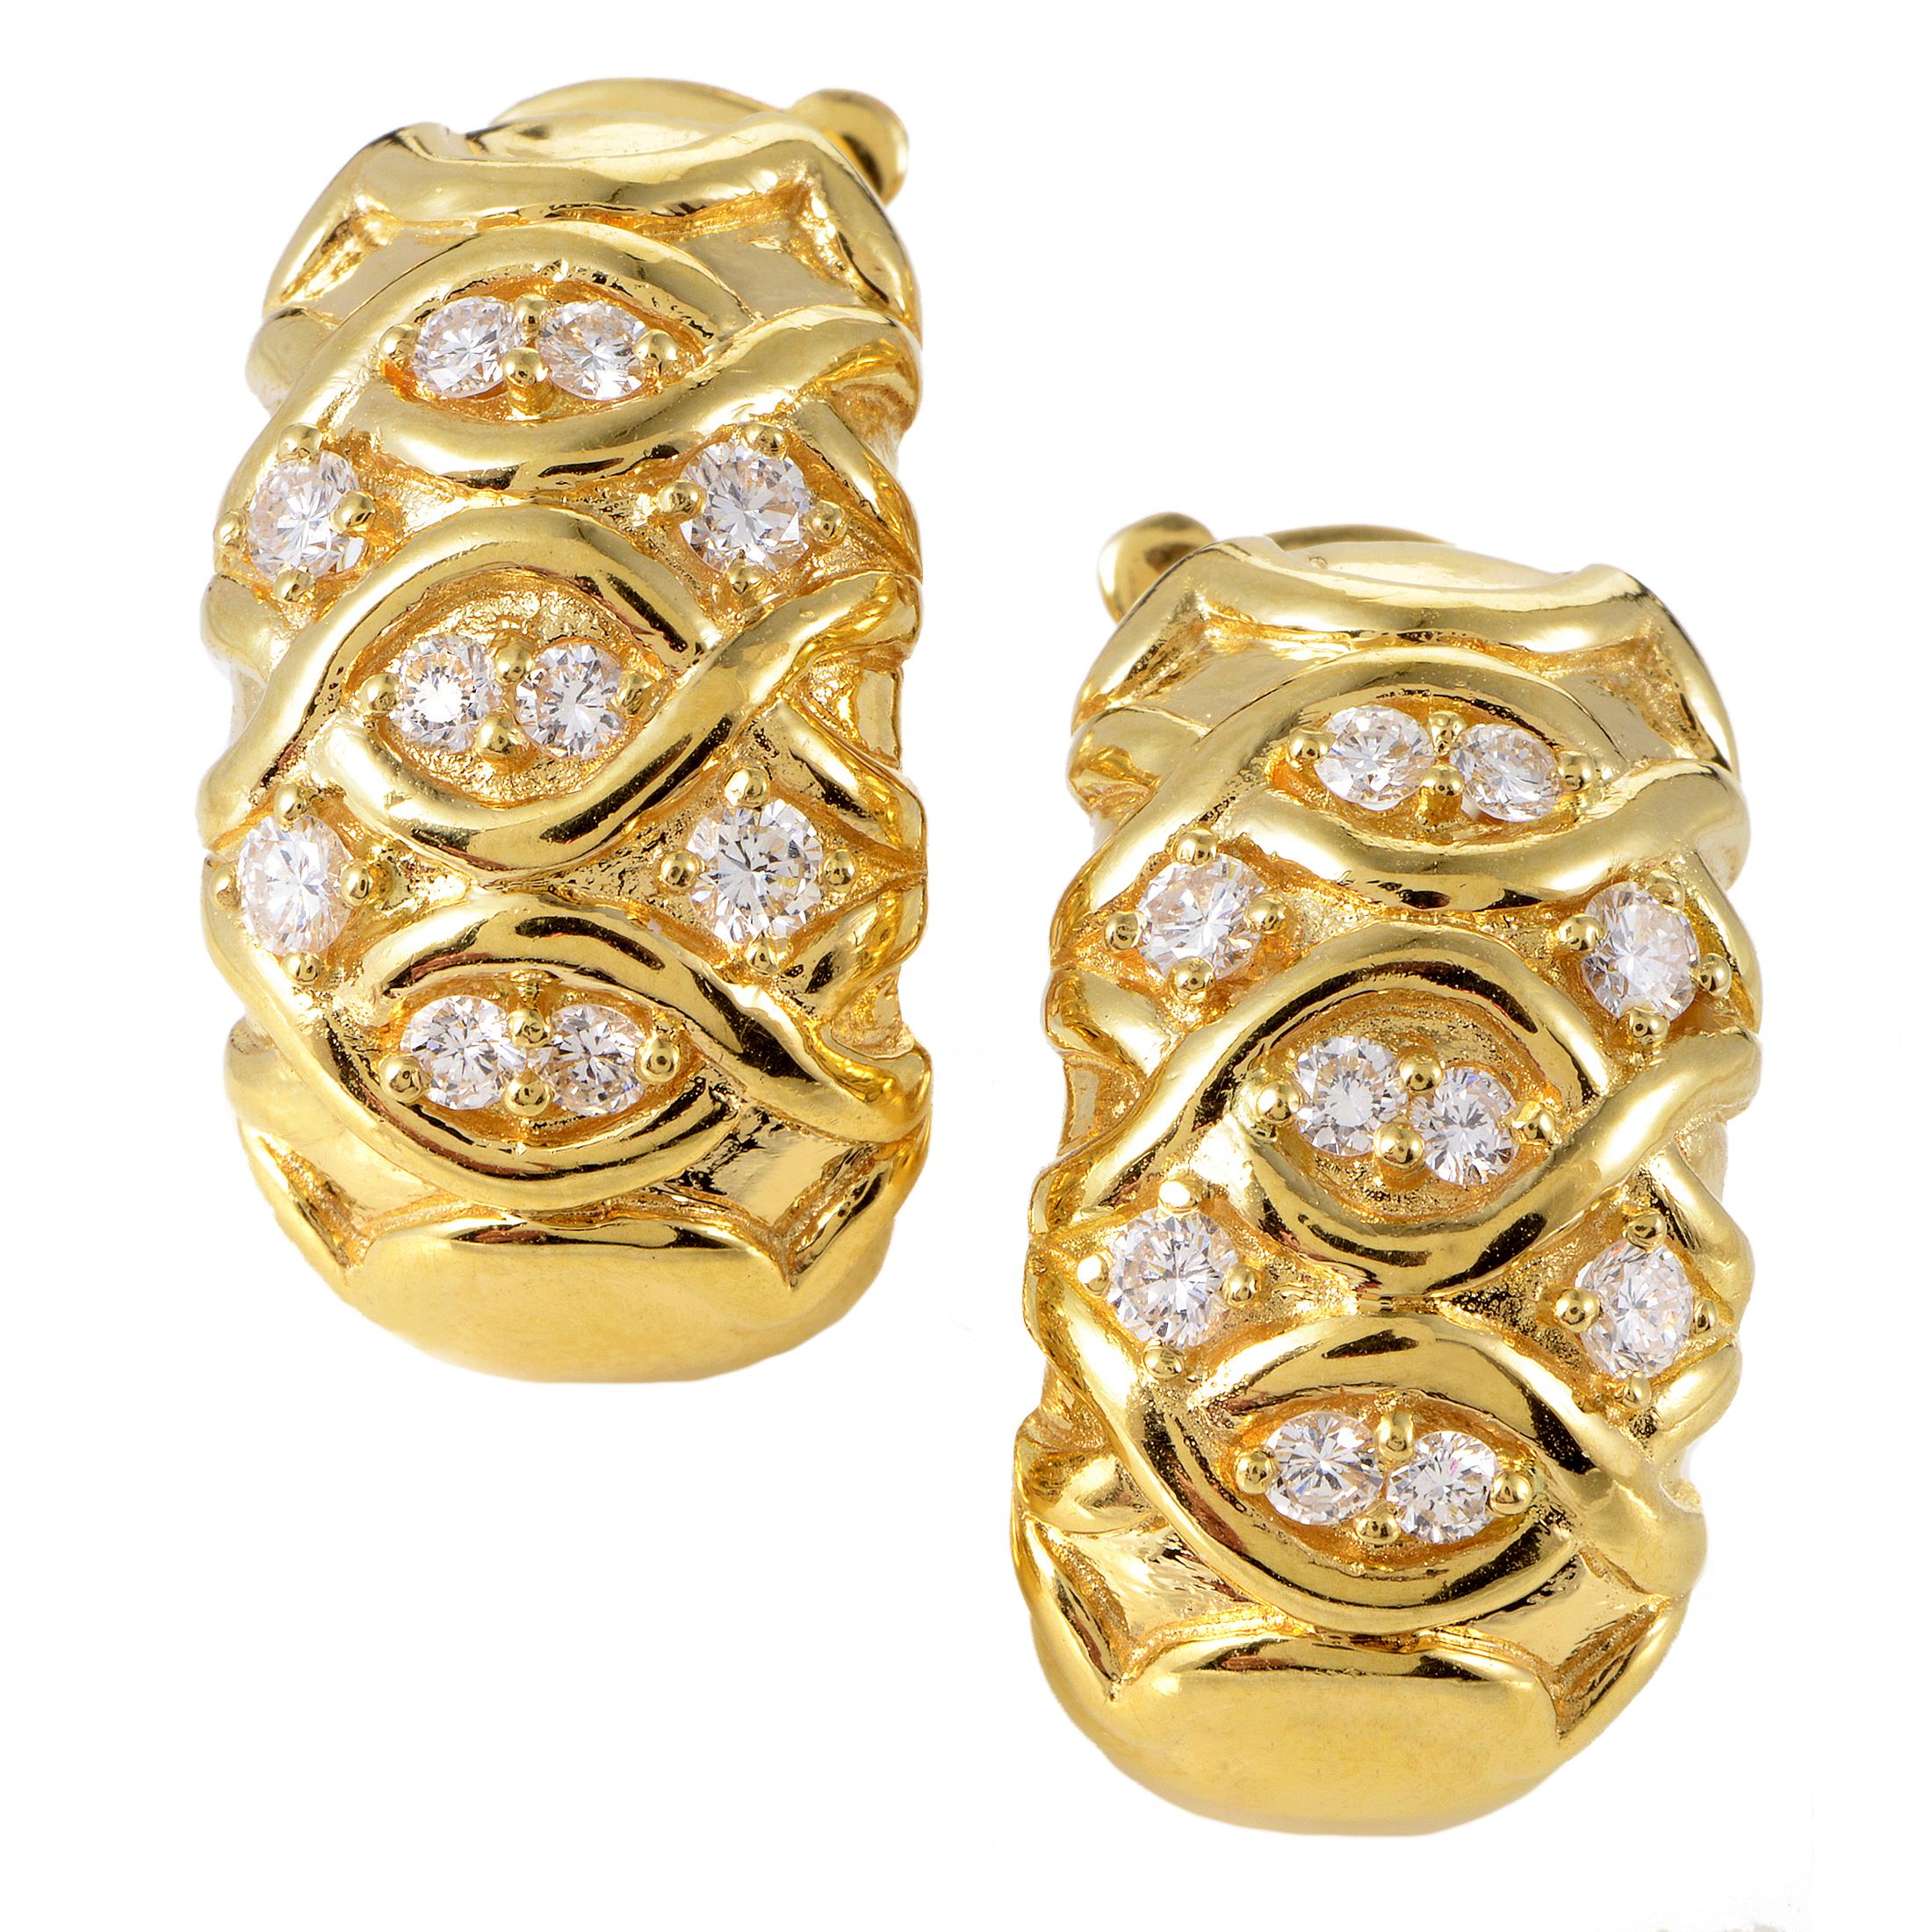 Dior Women's 18K Yellow Gold Diamond Clip-on Earrings